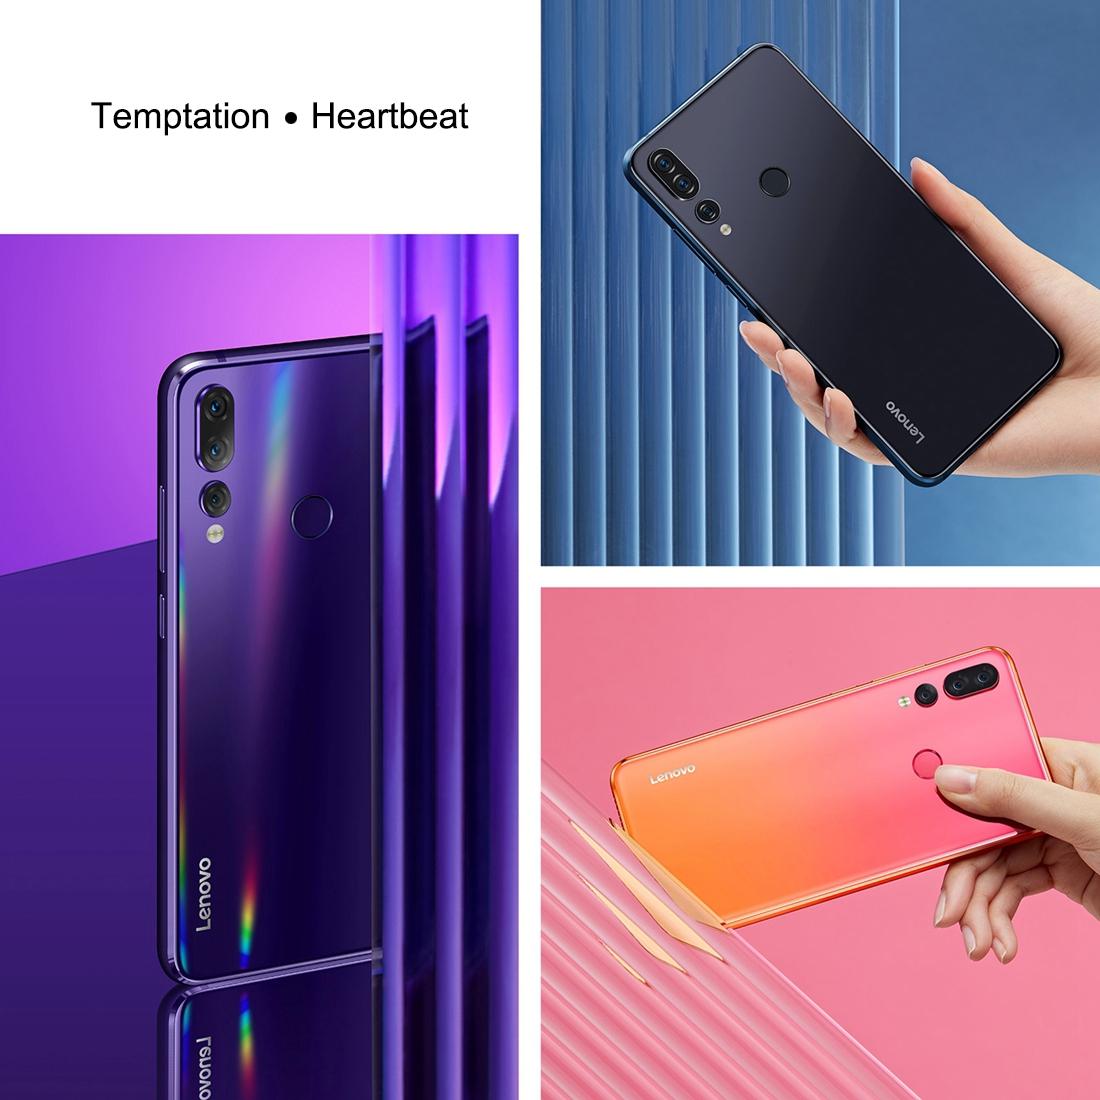 i.ibb.co/6RSqyRc/Smartphone-6-GB-de-Ram-64-GB-de-ROM-Lenovo-Z5s-18.jpg